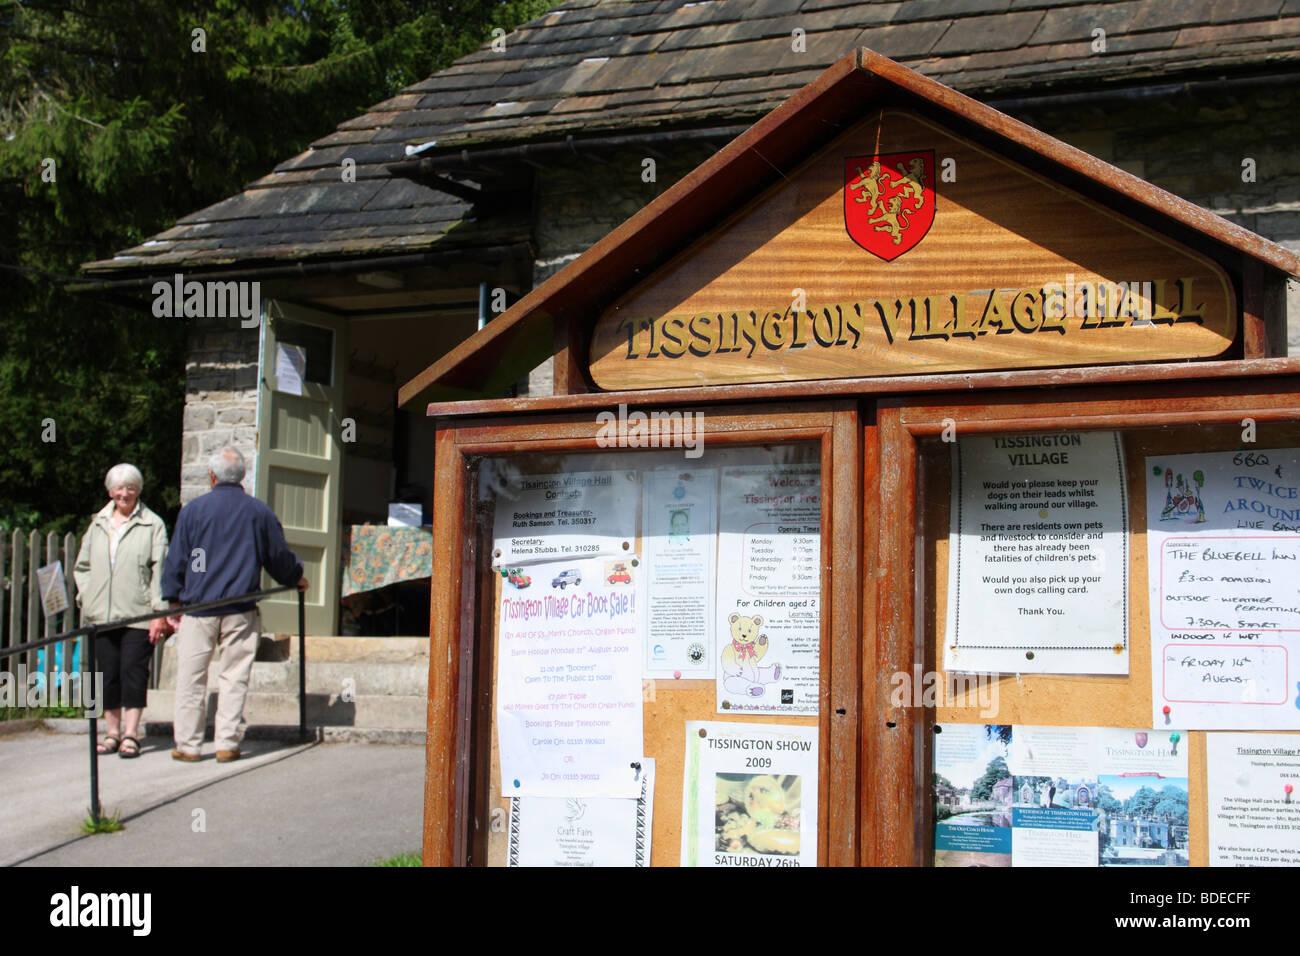 The village hall at Tissington, Derbyshire, England, U.K. - Stock Image